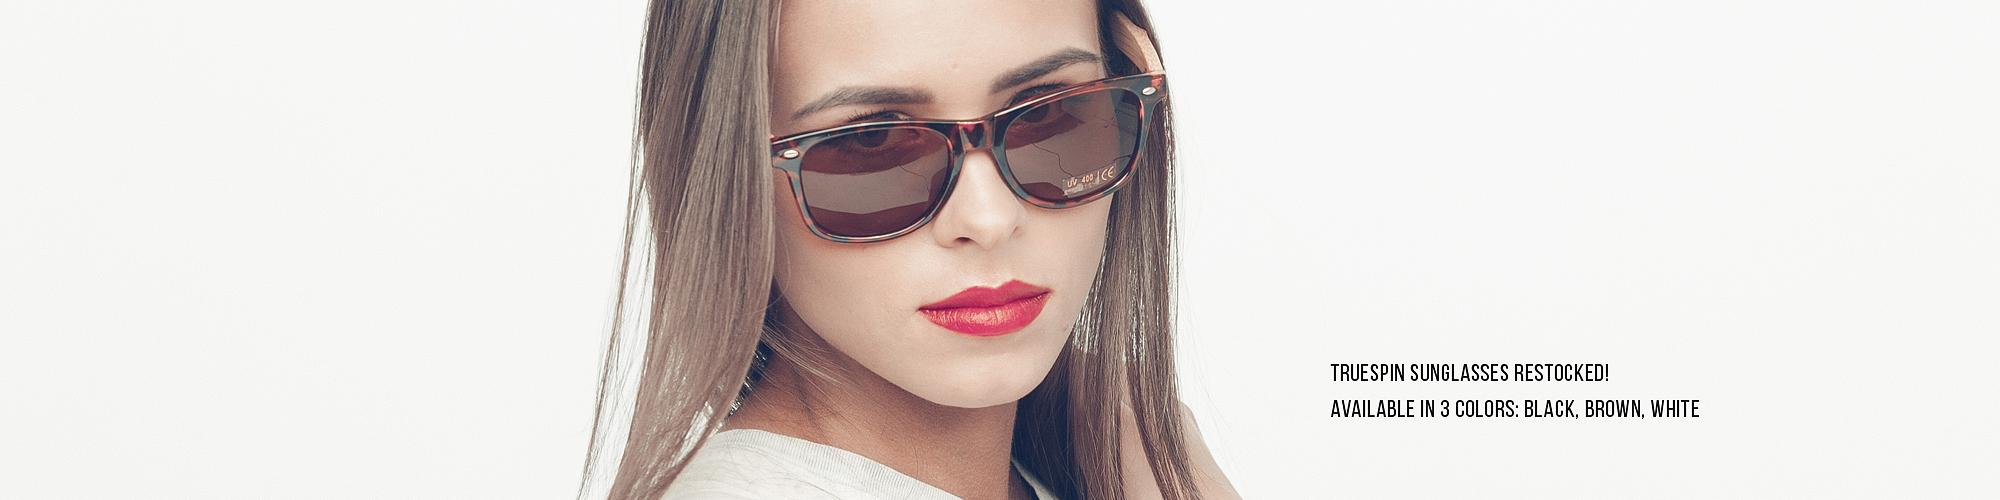 TrueSpin-Bamboo-Sunglasses